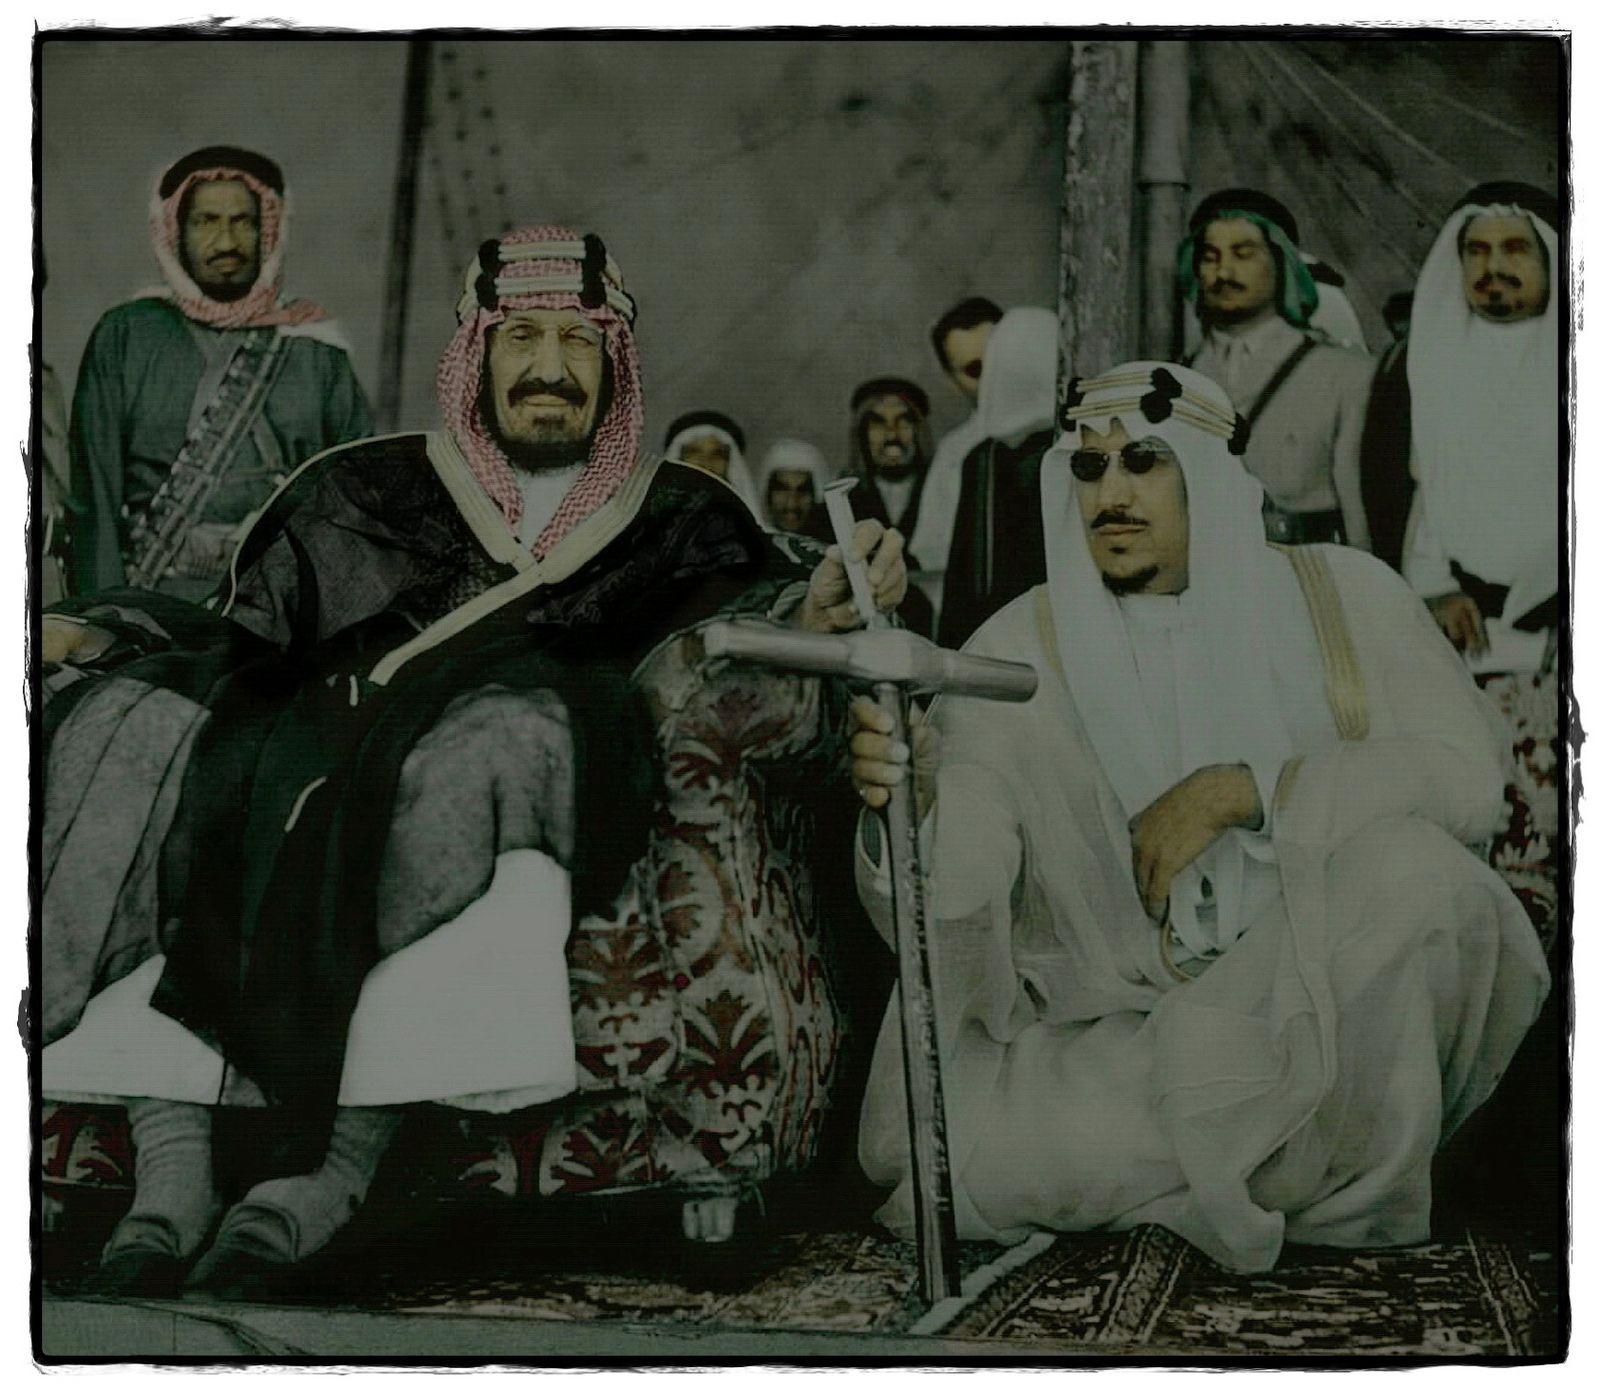 الملك عبدالعزيز والملك سعود بن عبدالعزيز Rare Pictures Saudi Arabia Culture My Images